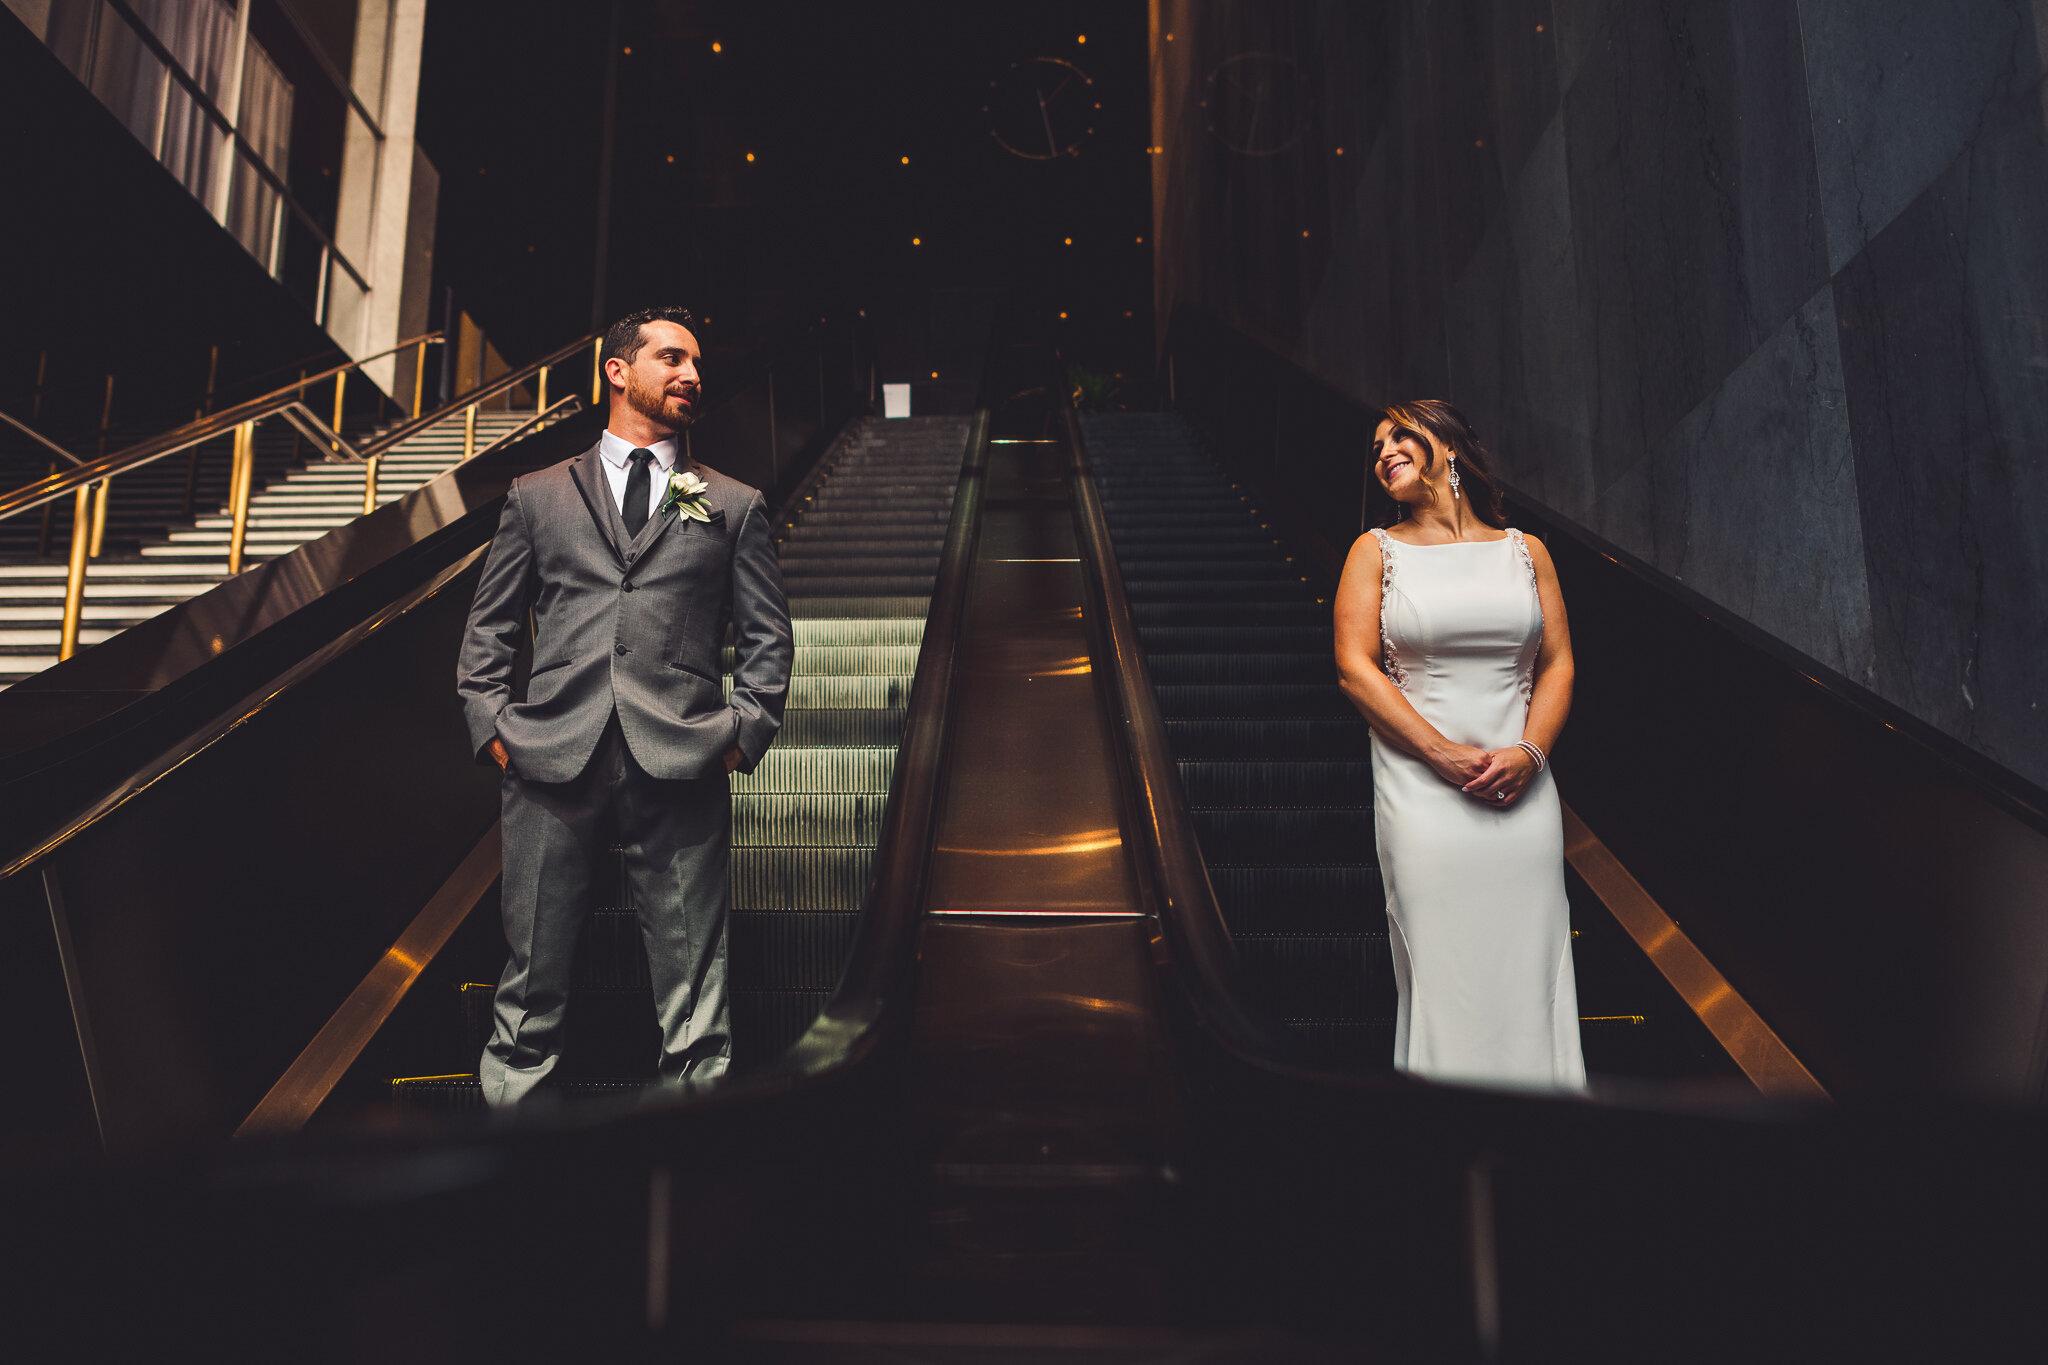 National-Museum-of-Jewish-American-History-Wedding-Rachel-Ryan-0001.jpg